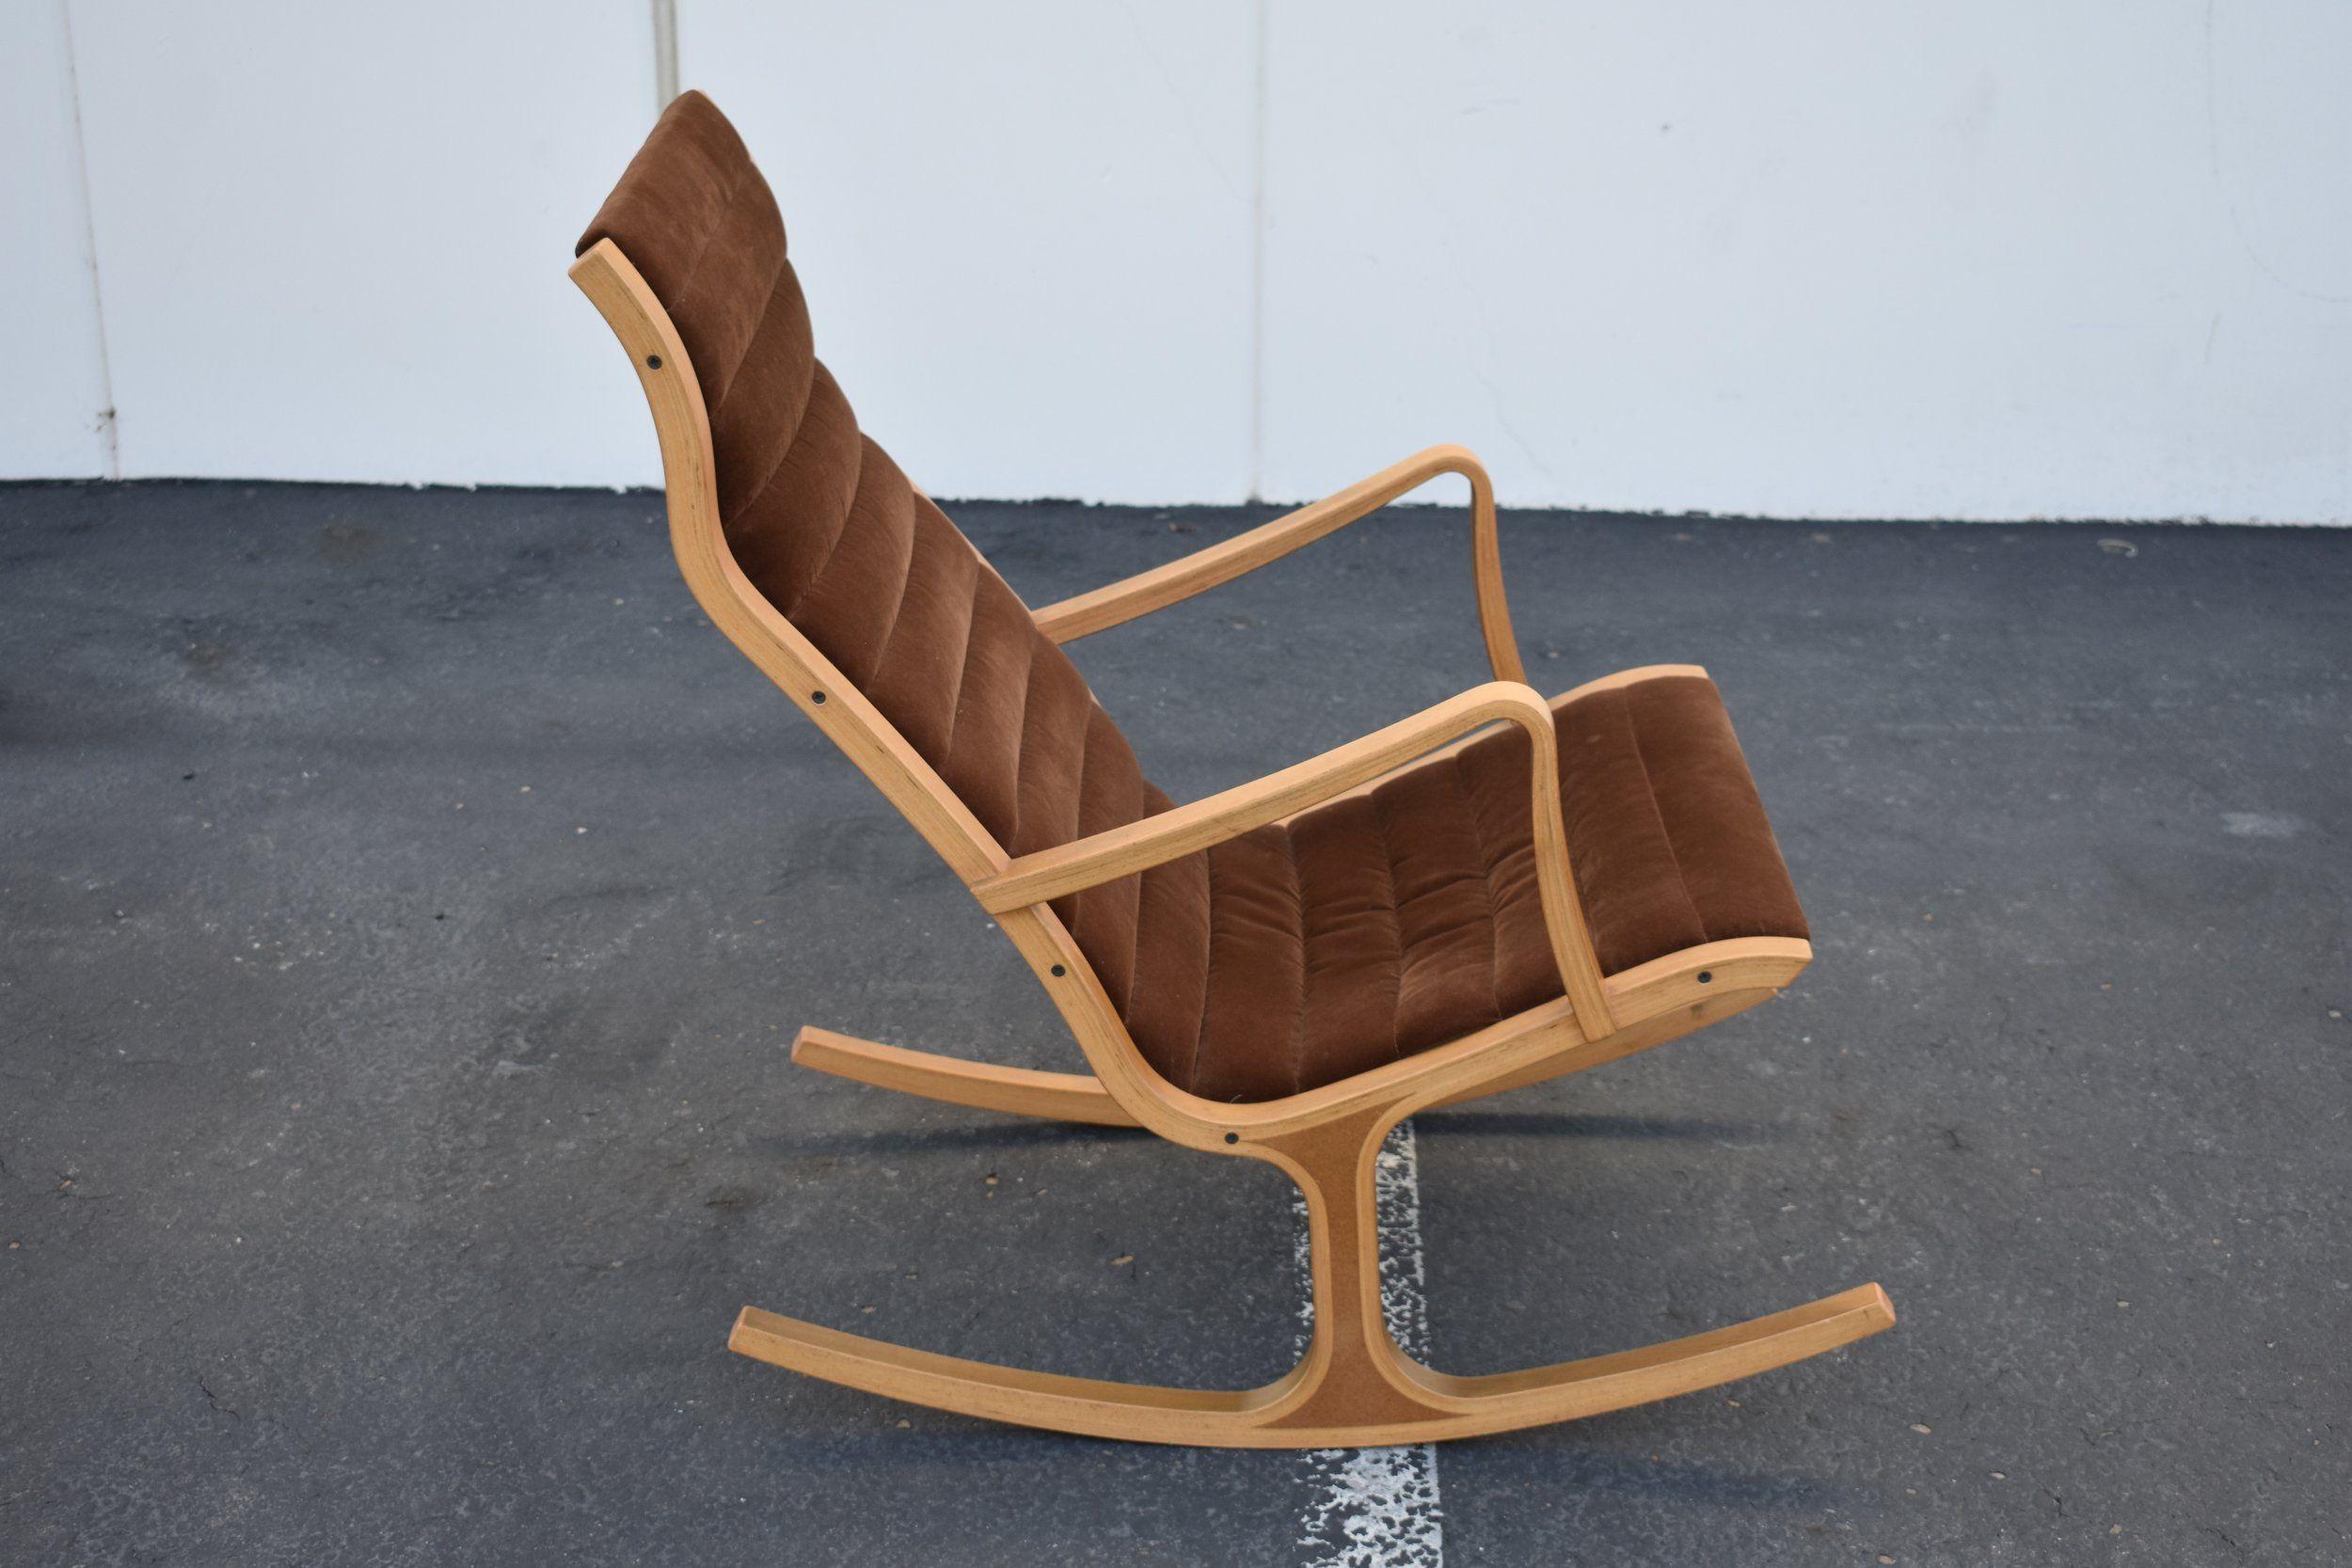 Ergonomic rocking chair designed by Mitsumasa Sugasawa for